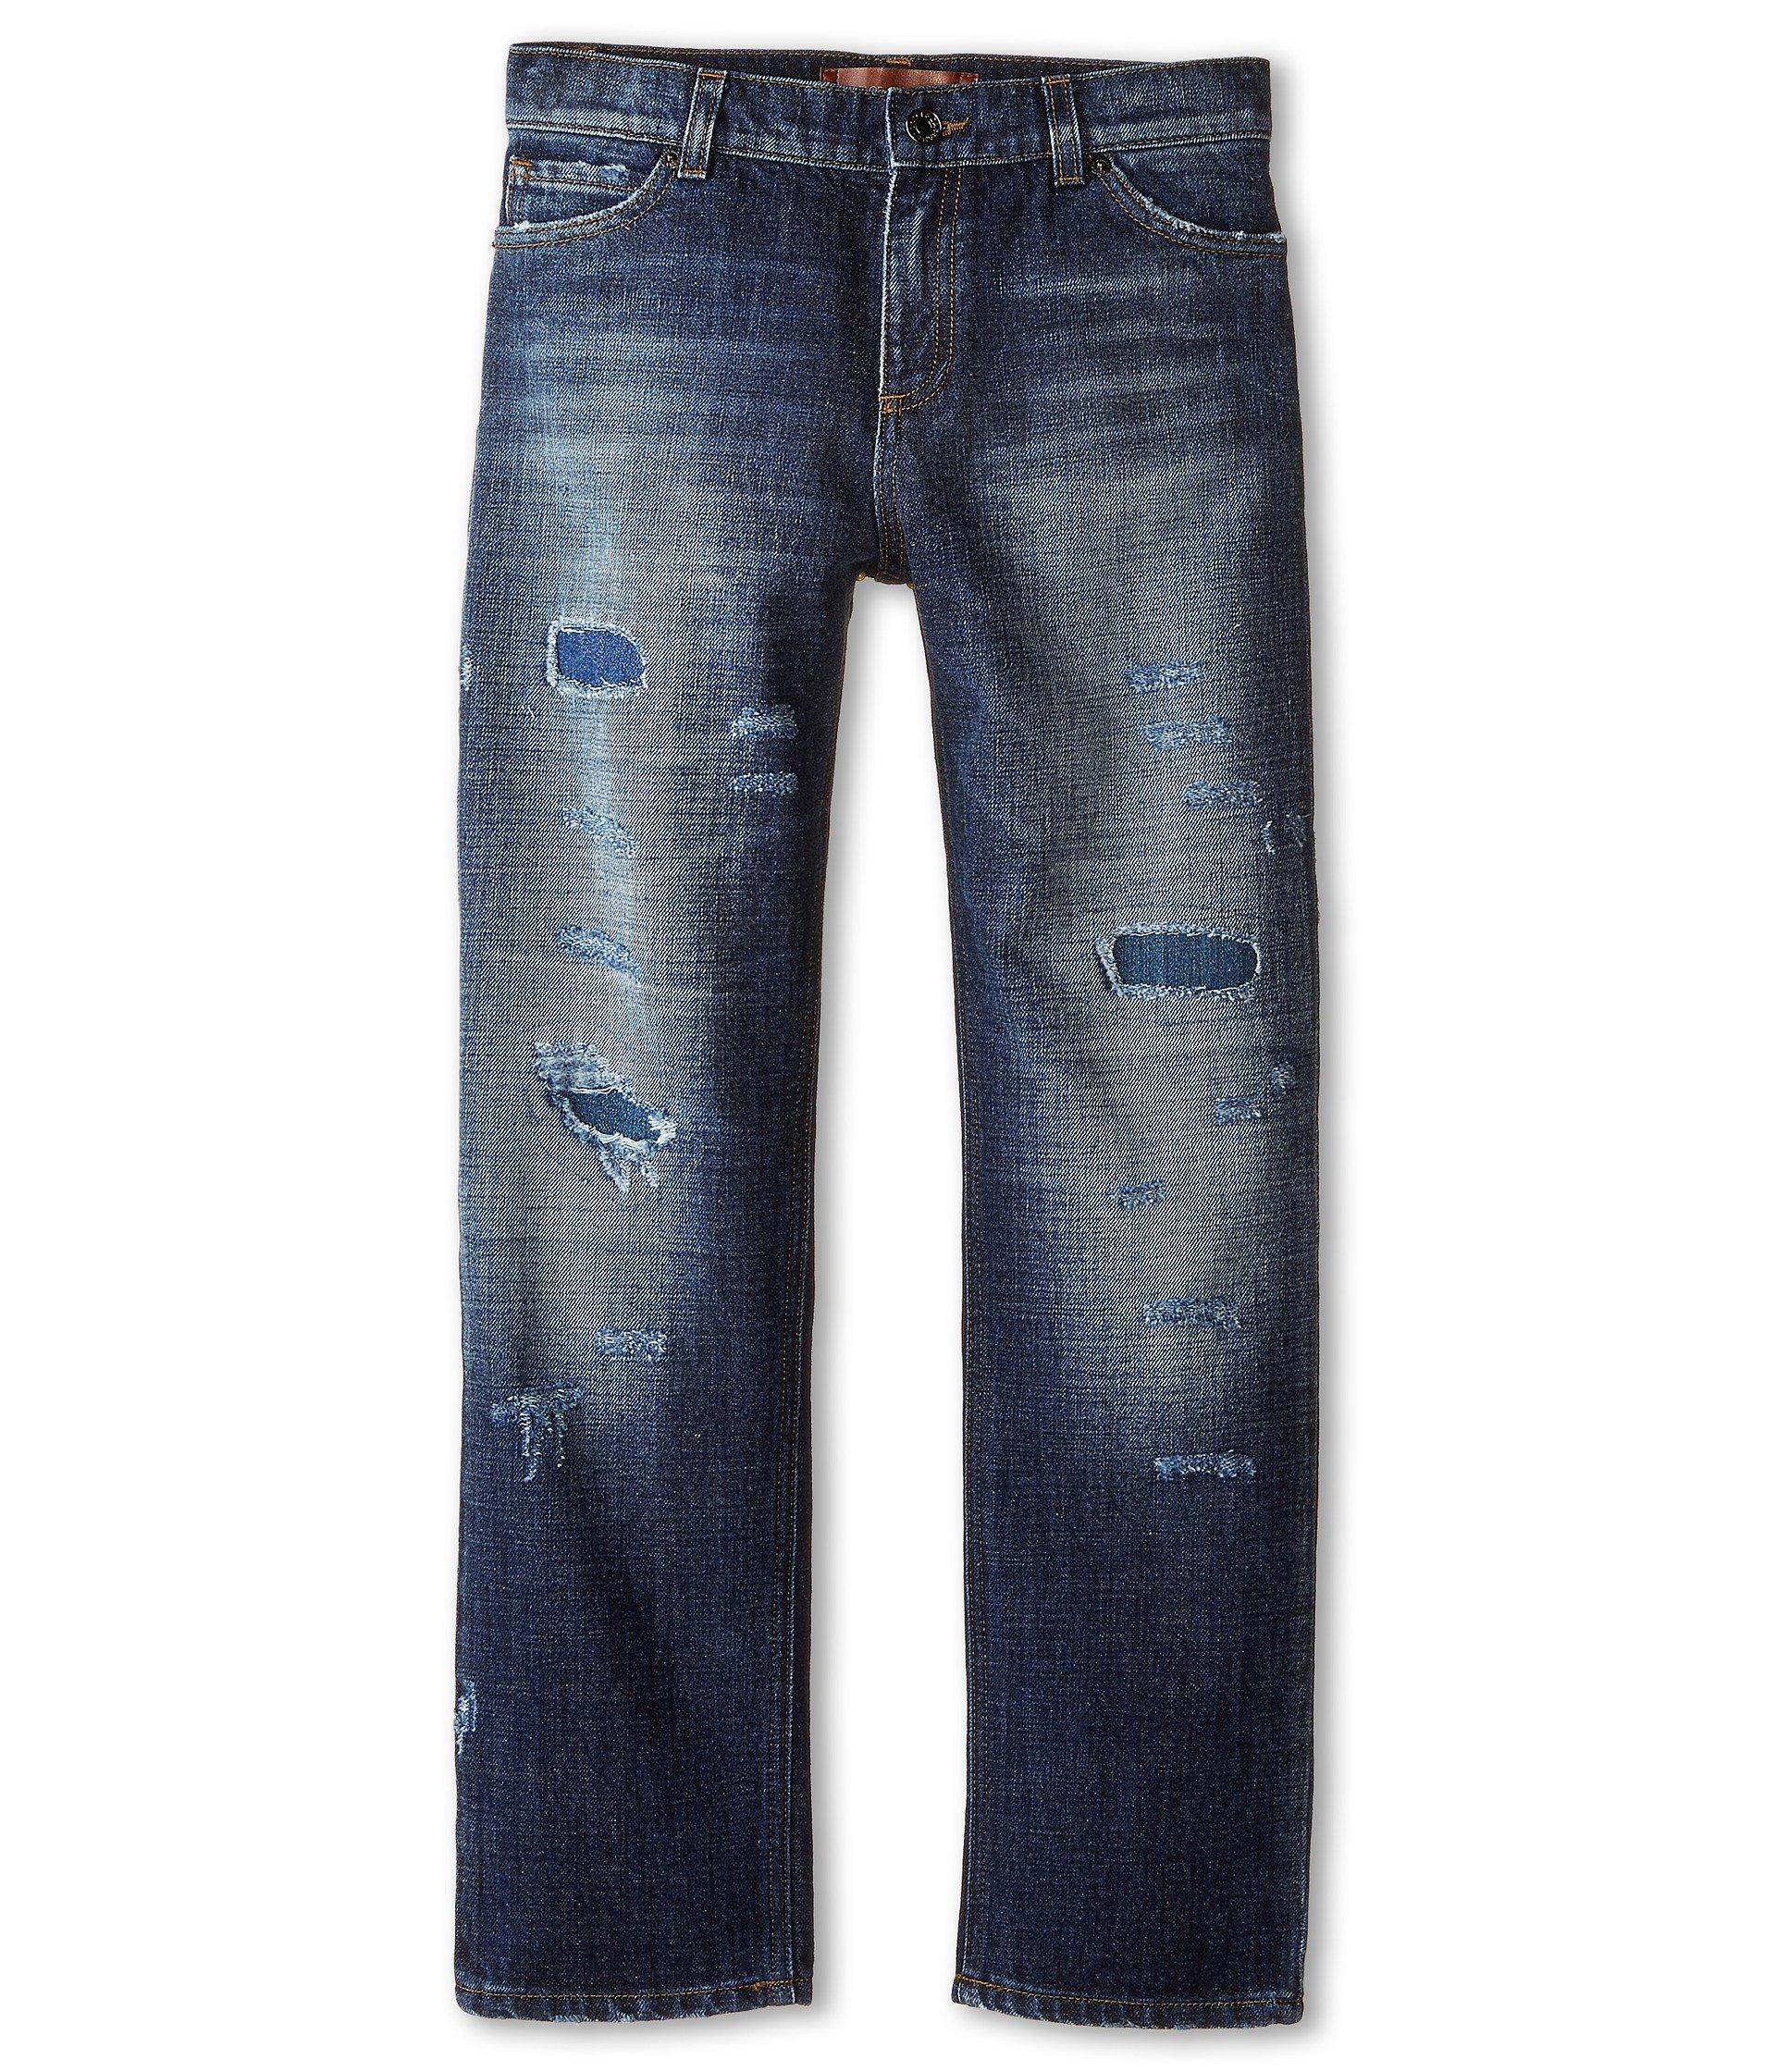 Dolce & Gabbana Kids Boy's Distressed Five-Pocket Jeans in Blue Denim/Blue (Big Kids) Blue Denim/Blue Jeans